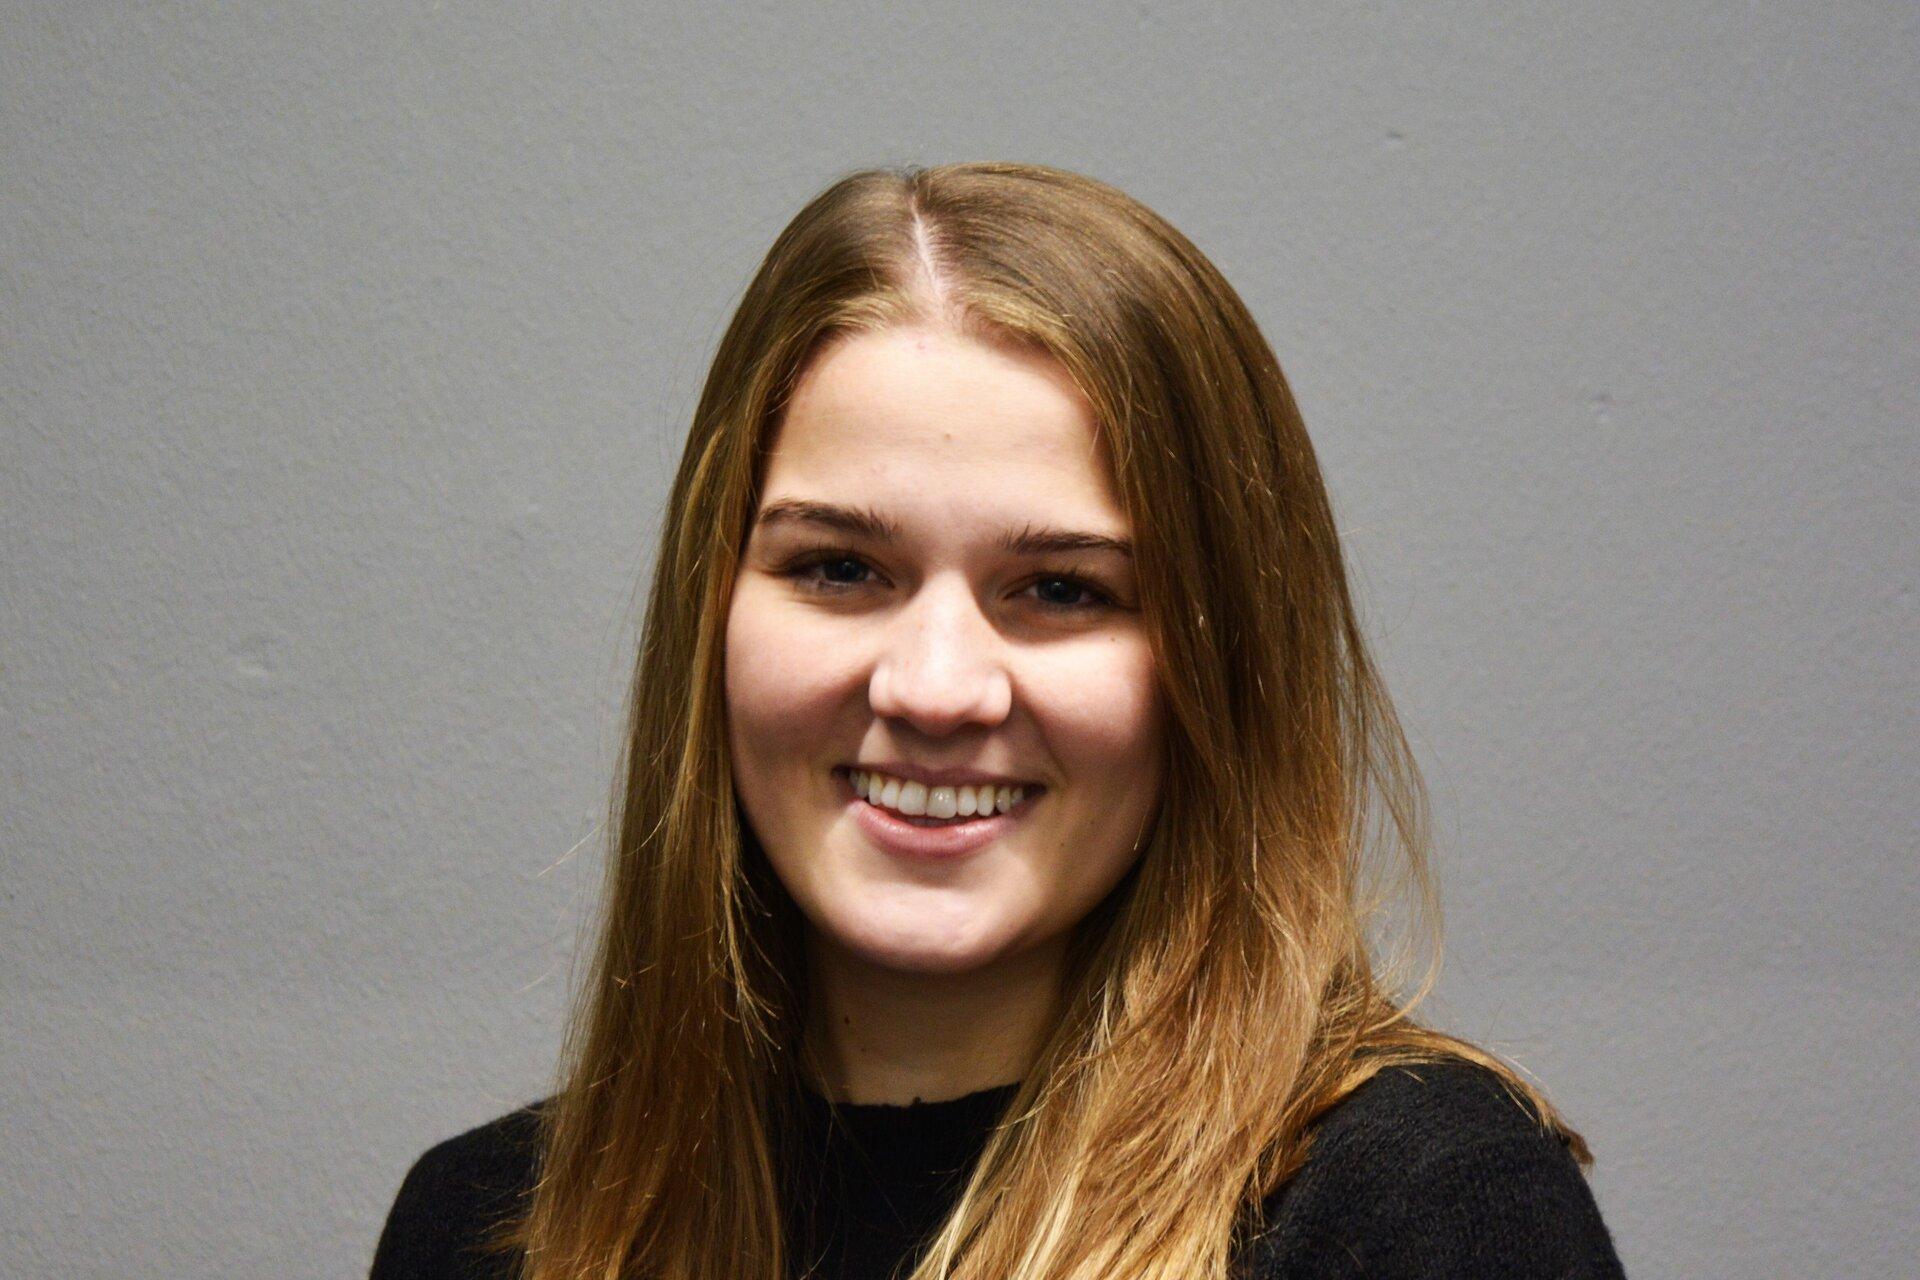 Lara Wilke